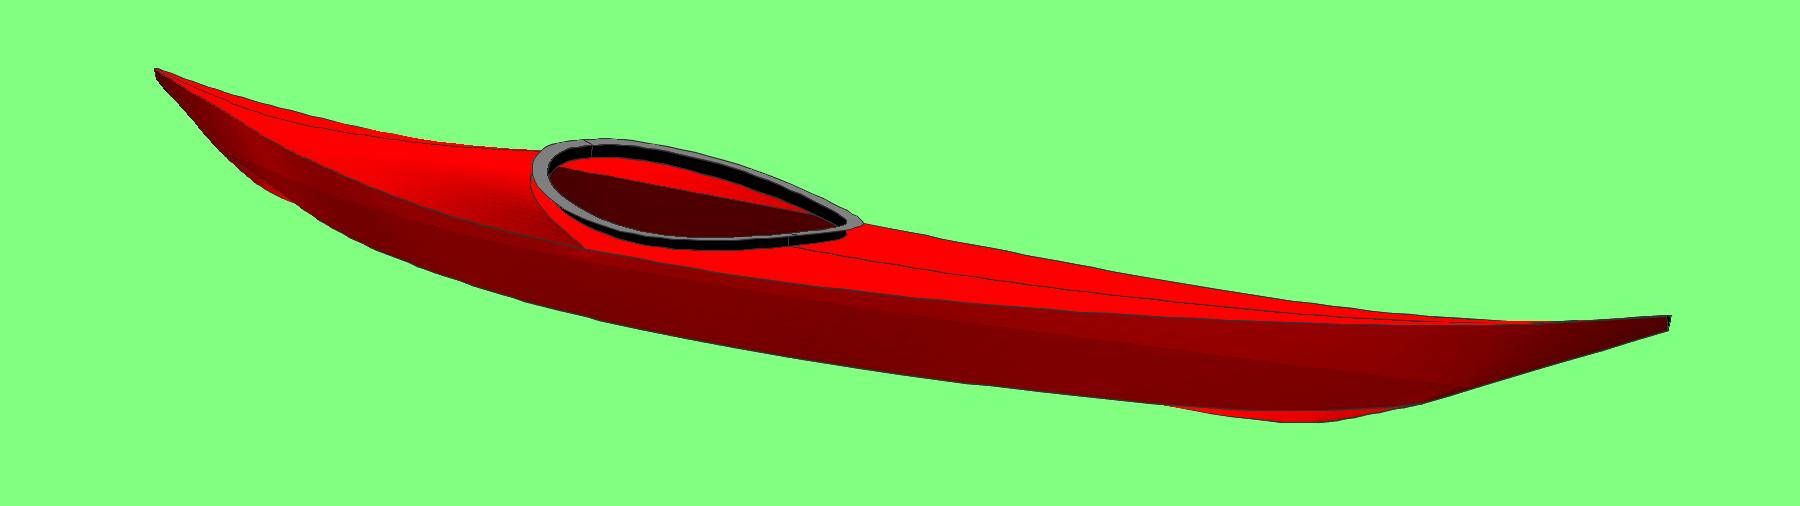 clipart royalty free stock . Kayaking clipart wooden canoe